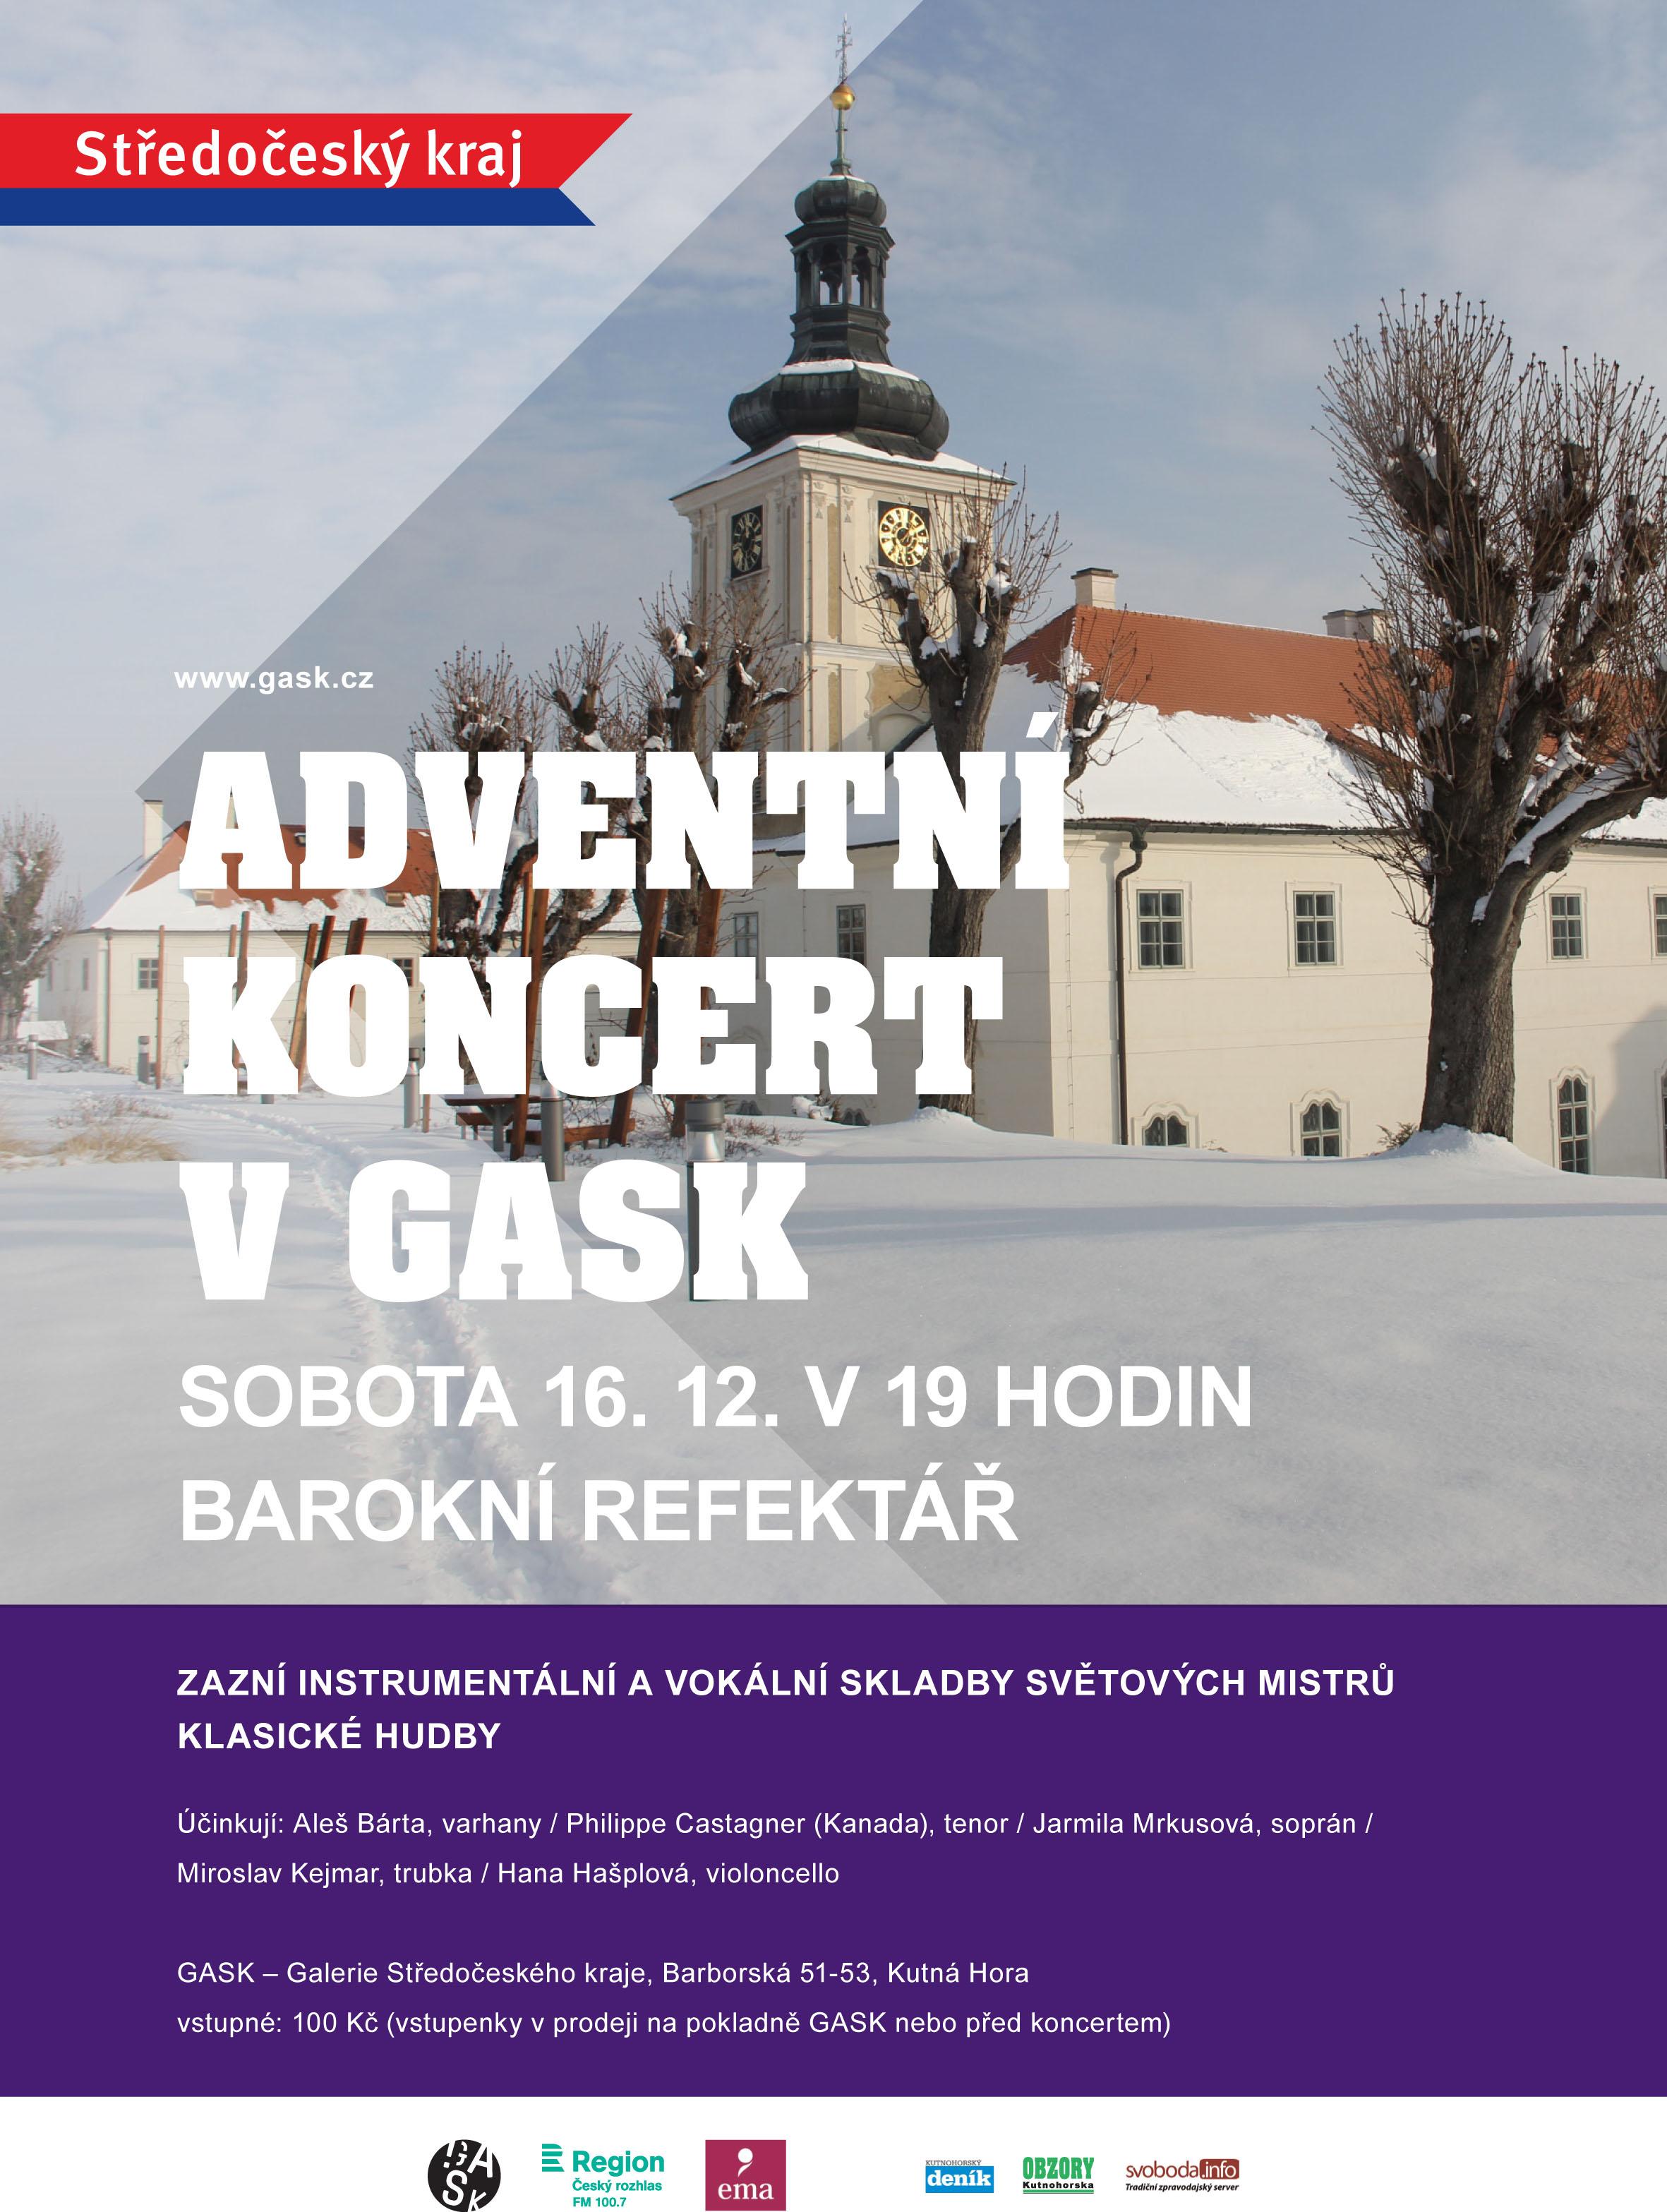 2956-adventni-koncert-el.jpg